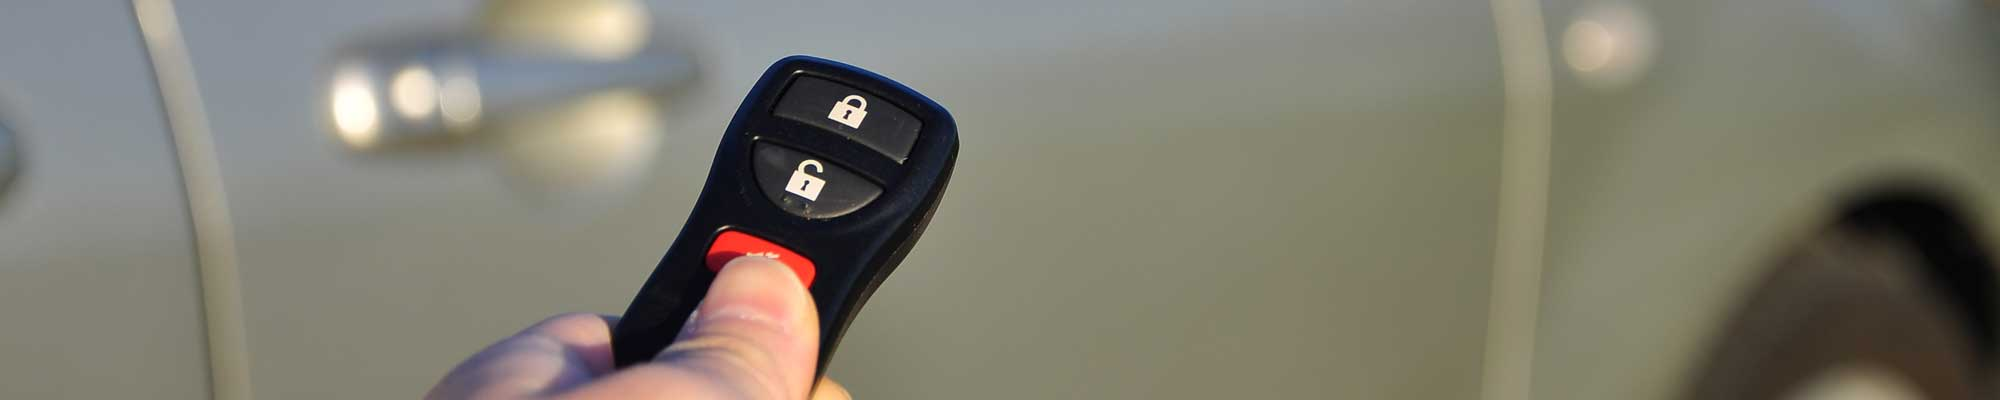 Lost Car Keys Need New One